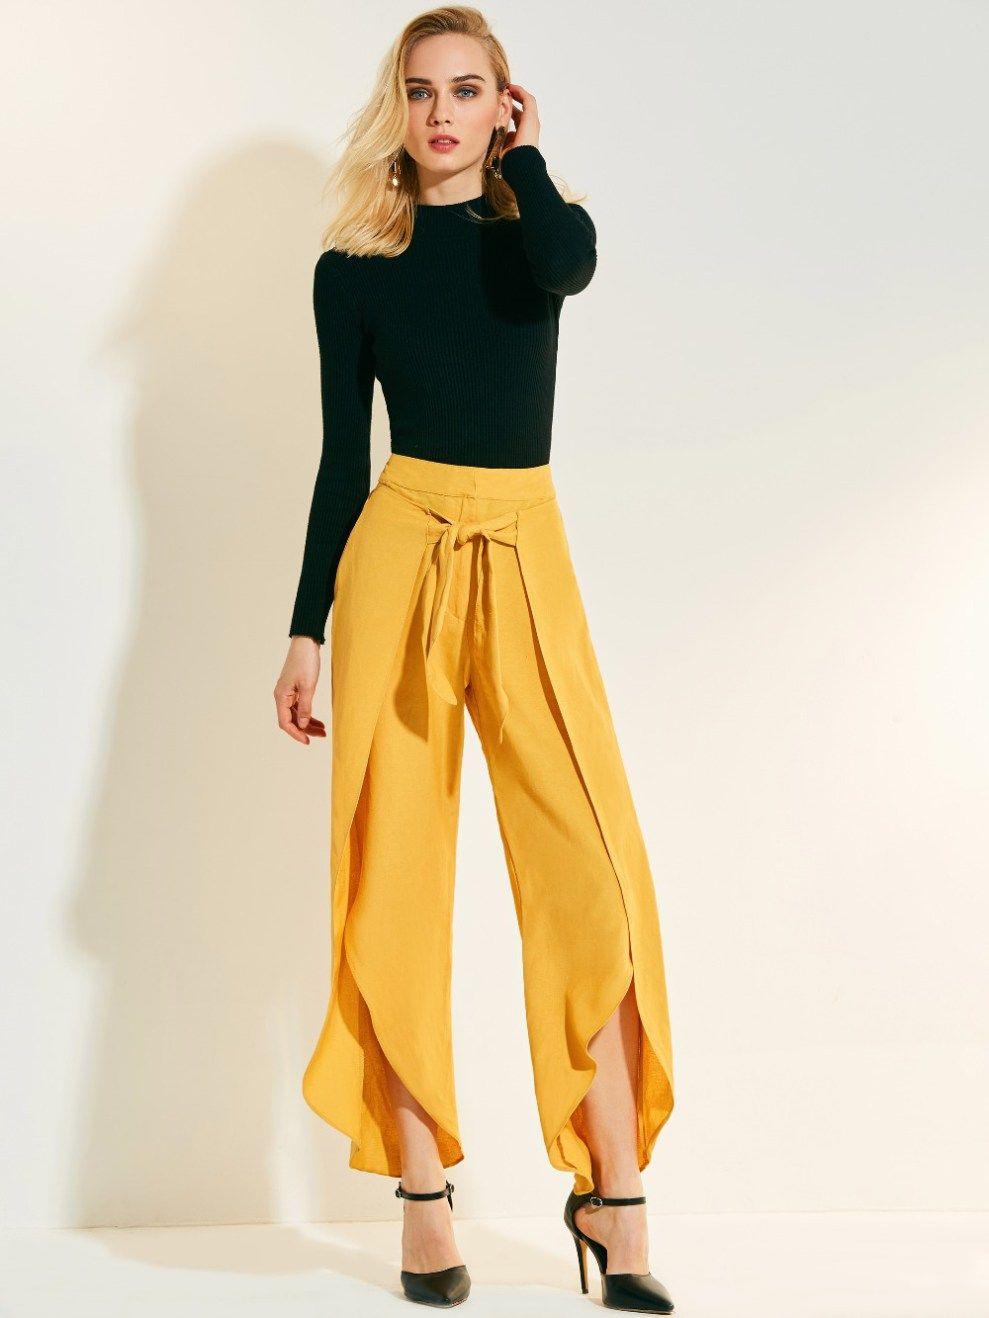 4868cbd60d8 Fit To Be Tied Pants in 2019 | Fashion | Fashion pants, Fashion, Pants